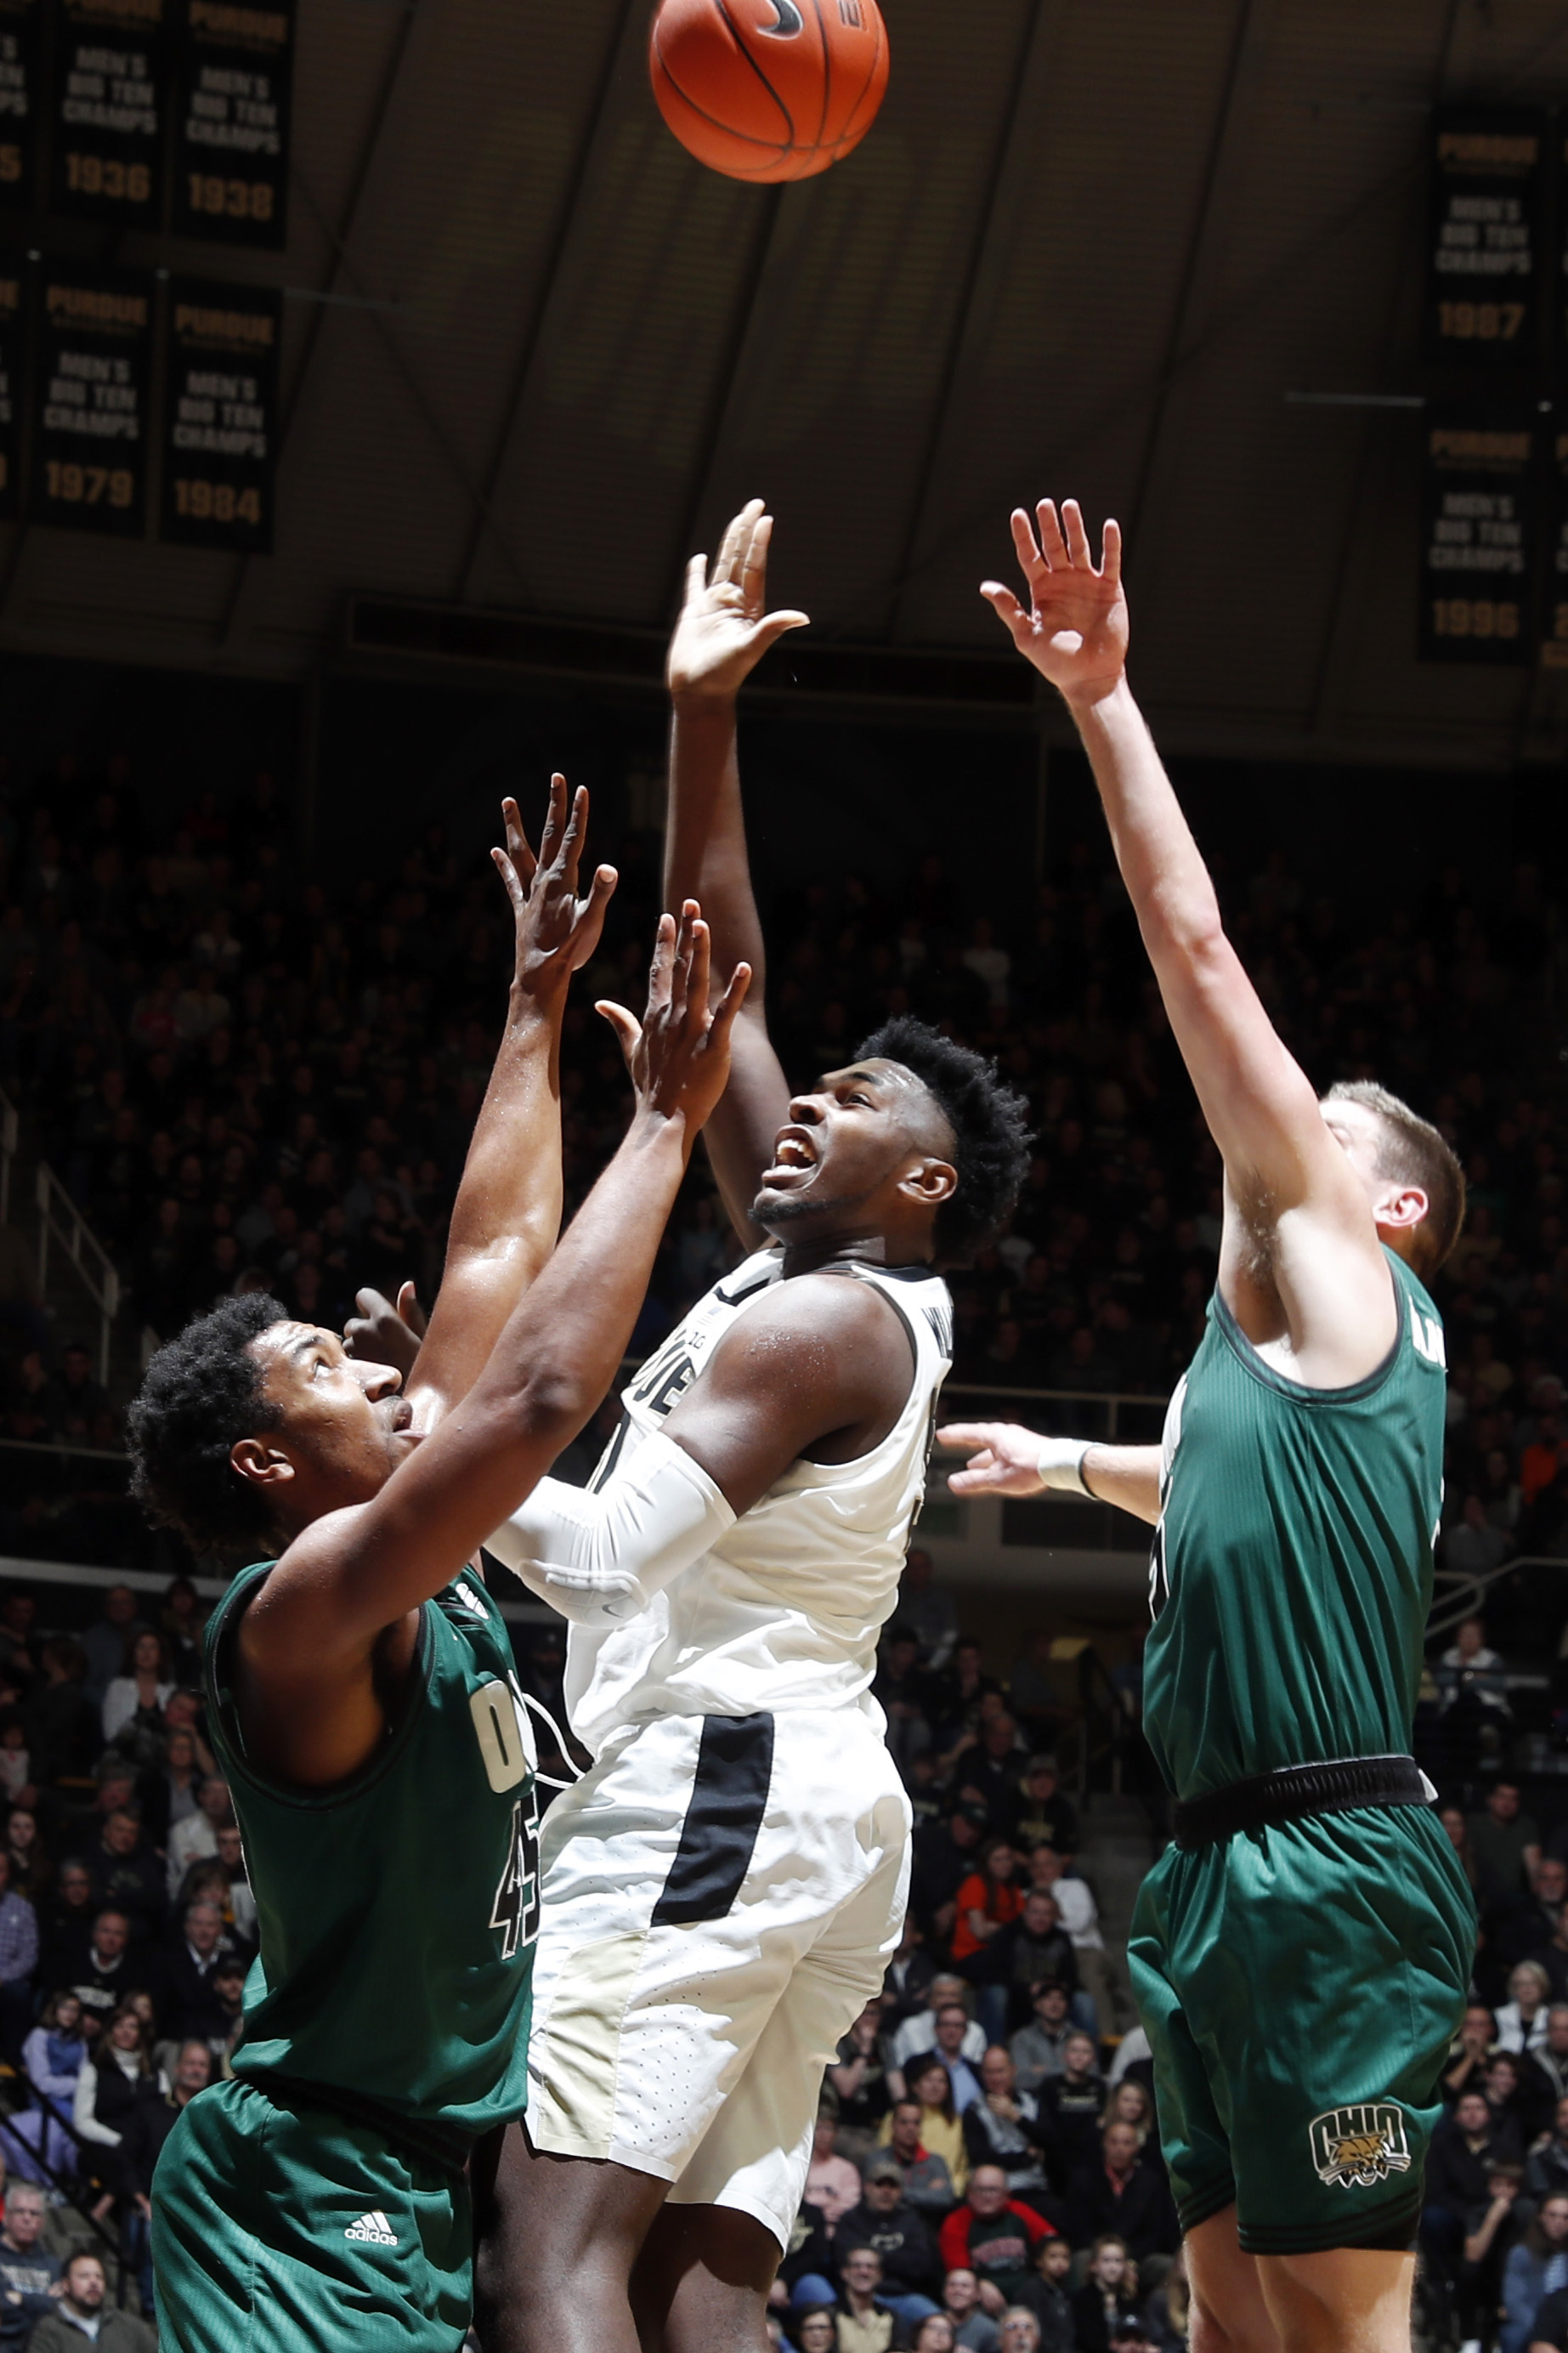 NCAA Basketball: Ohio at Purdue